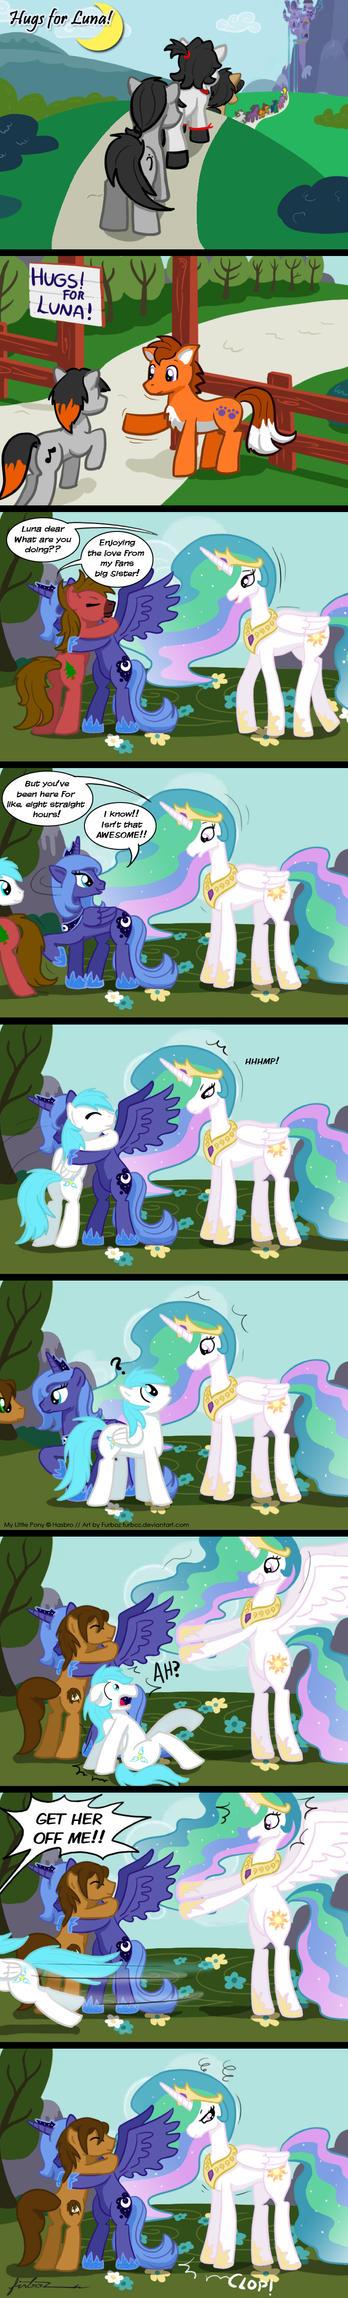 Hugs for Luna by Furboz